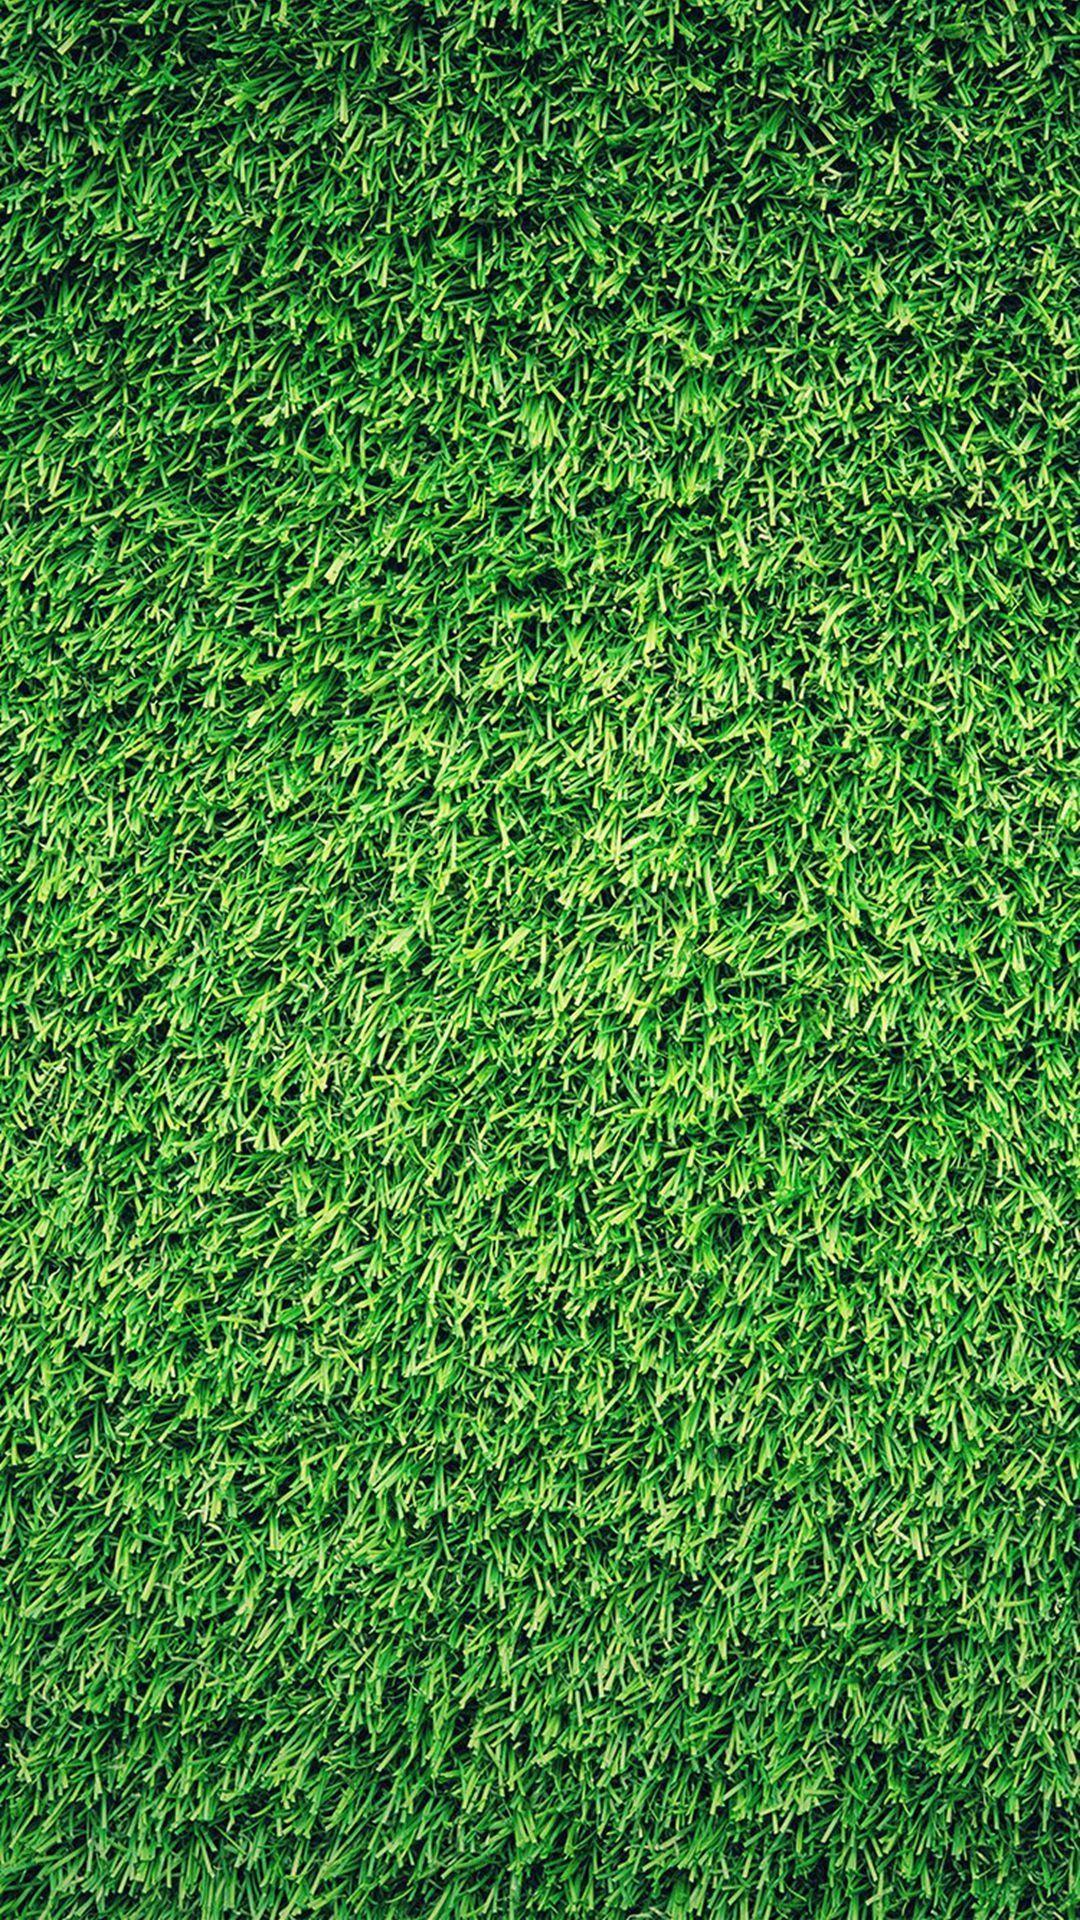 Grass Iphone Wallpapers Top Free Grass Iphone Backgrounds Wallpaperaccess